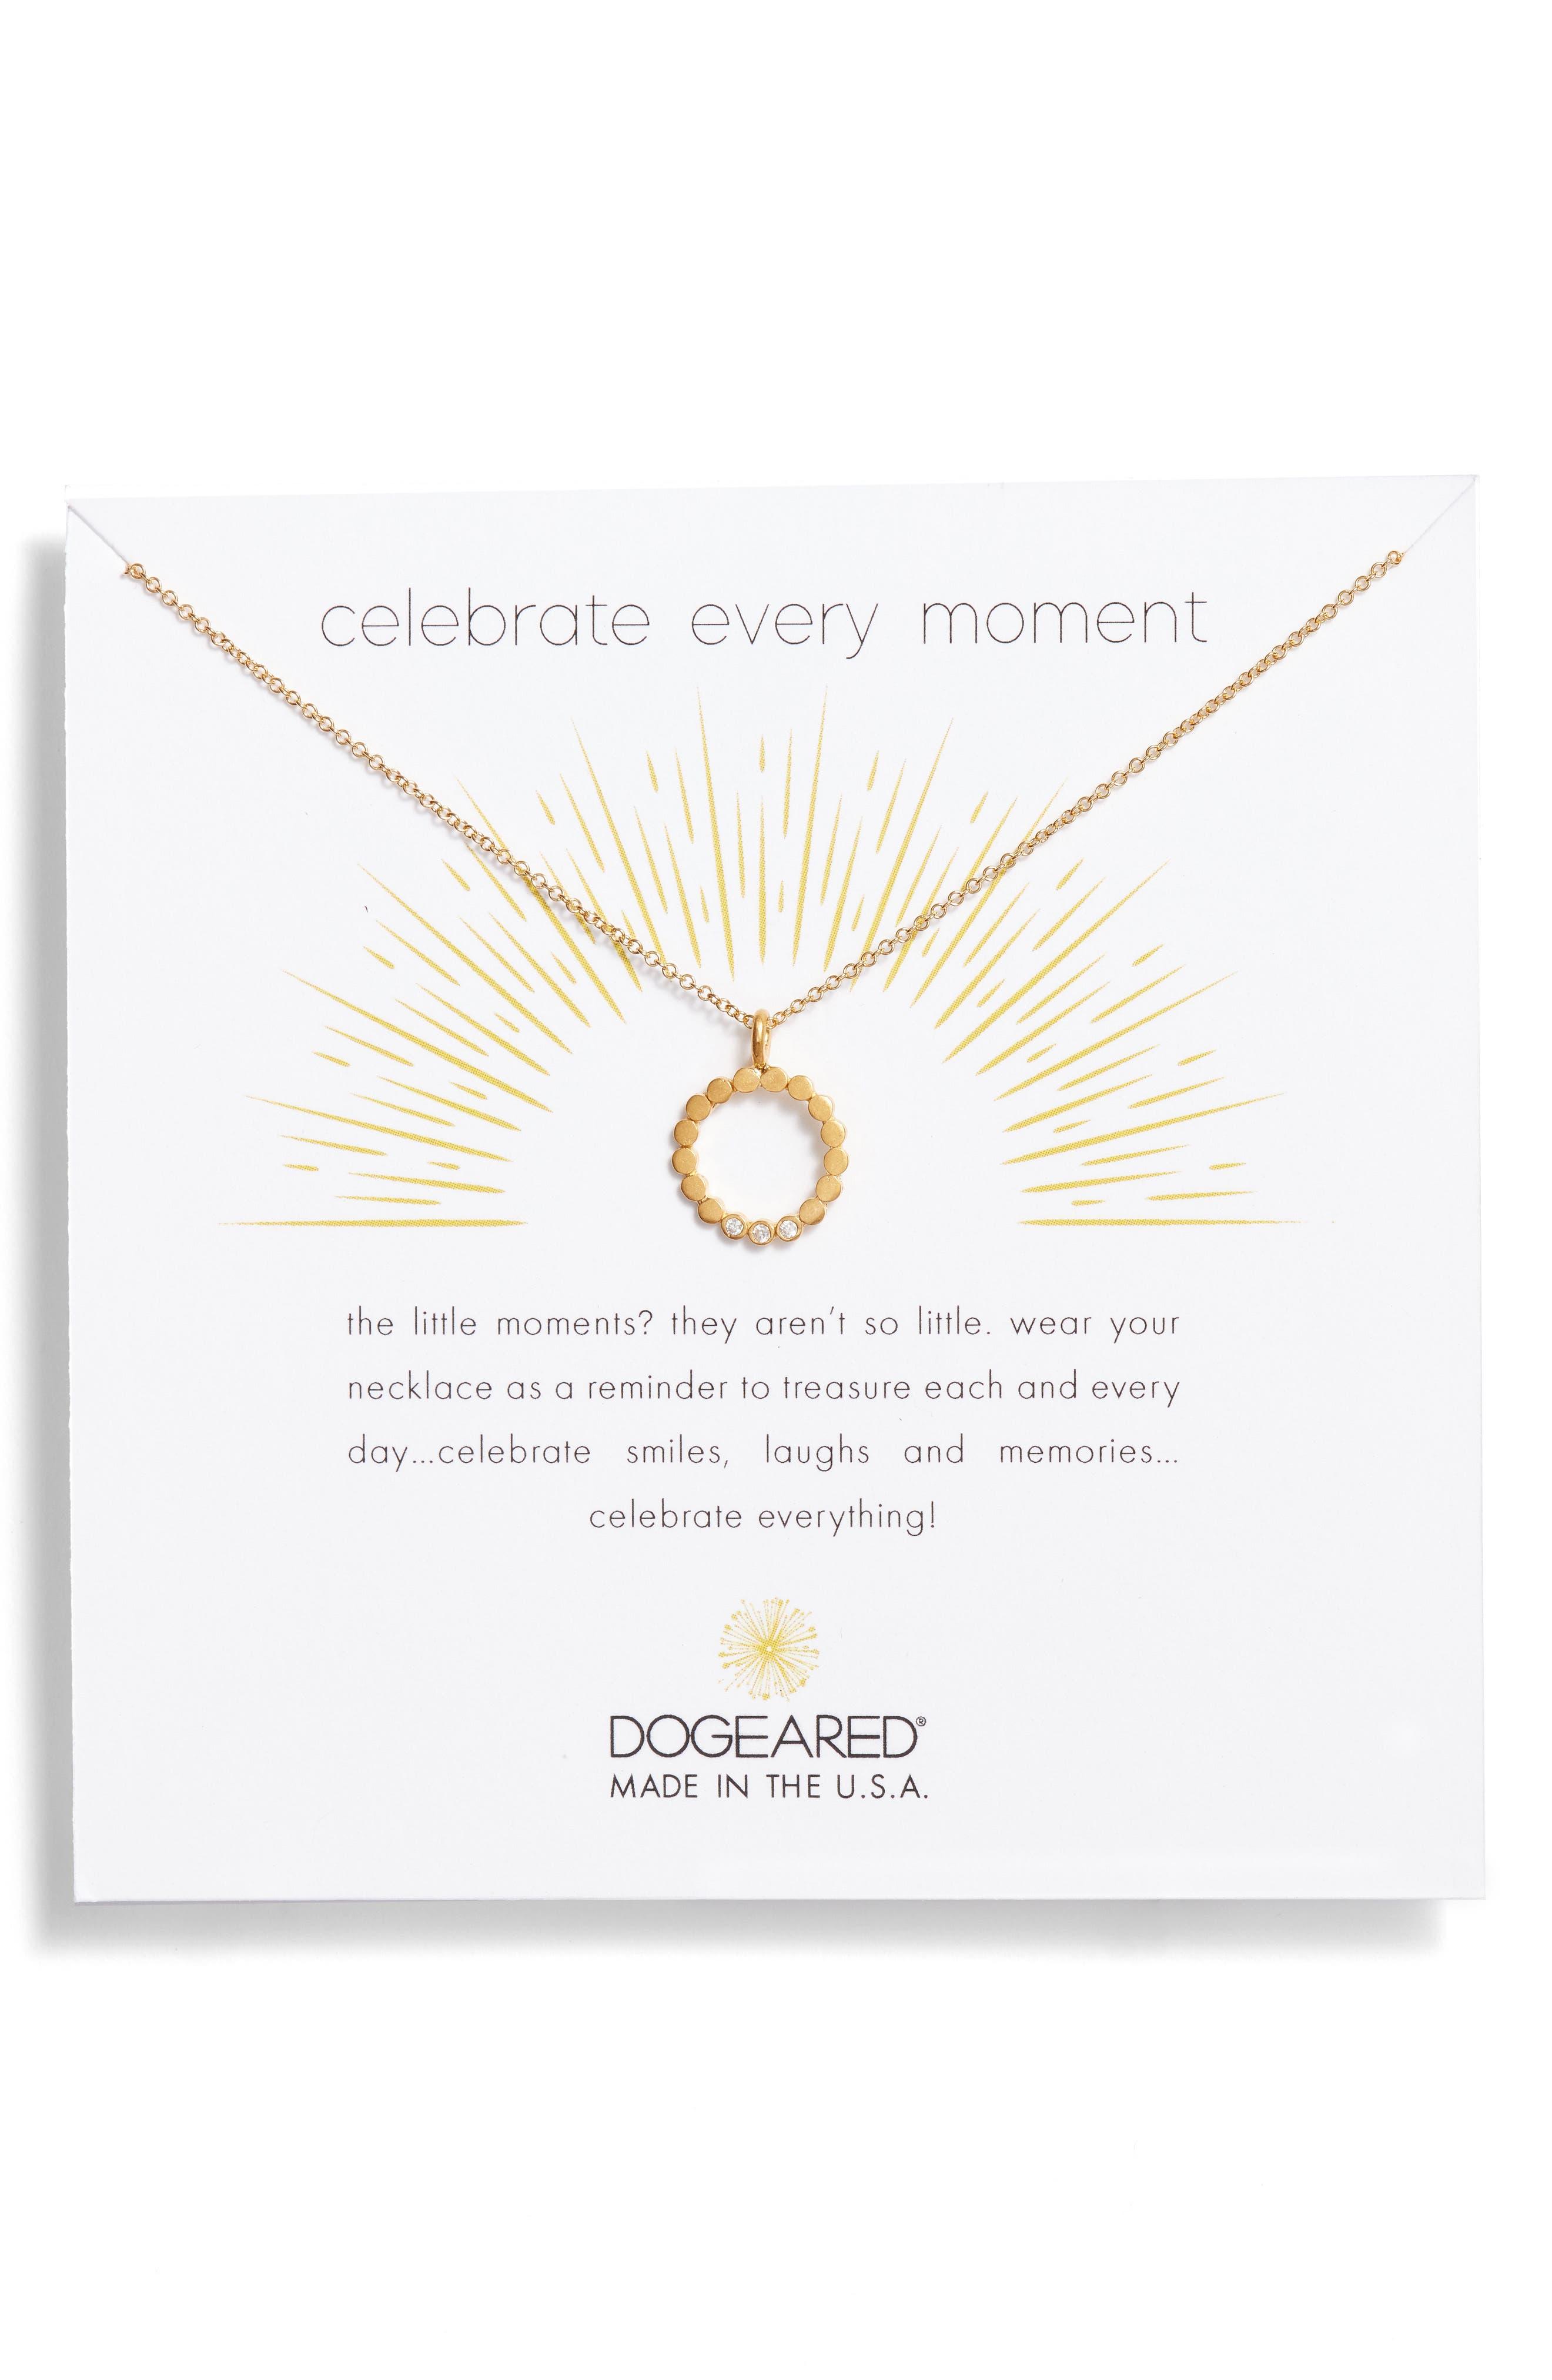 Dogeared Celebrate Every Moment Pendant Necklace